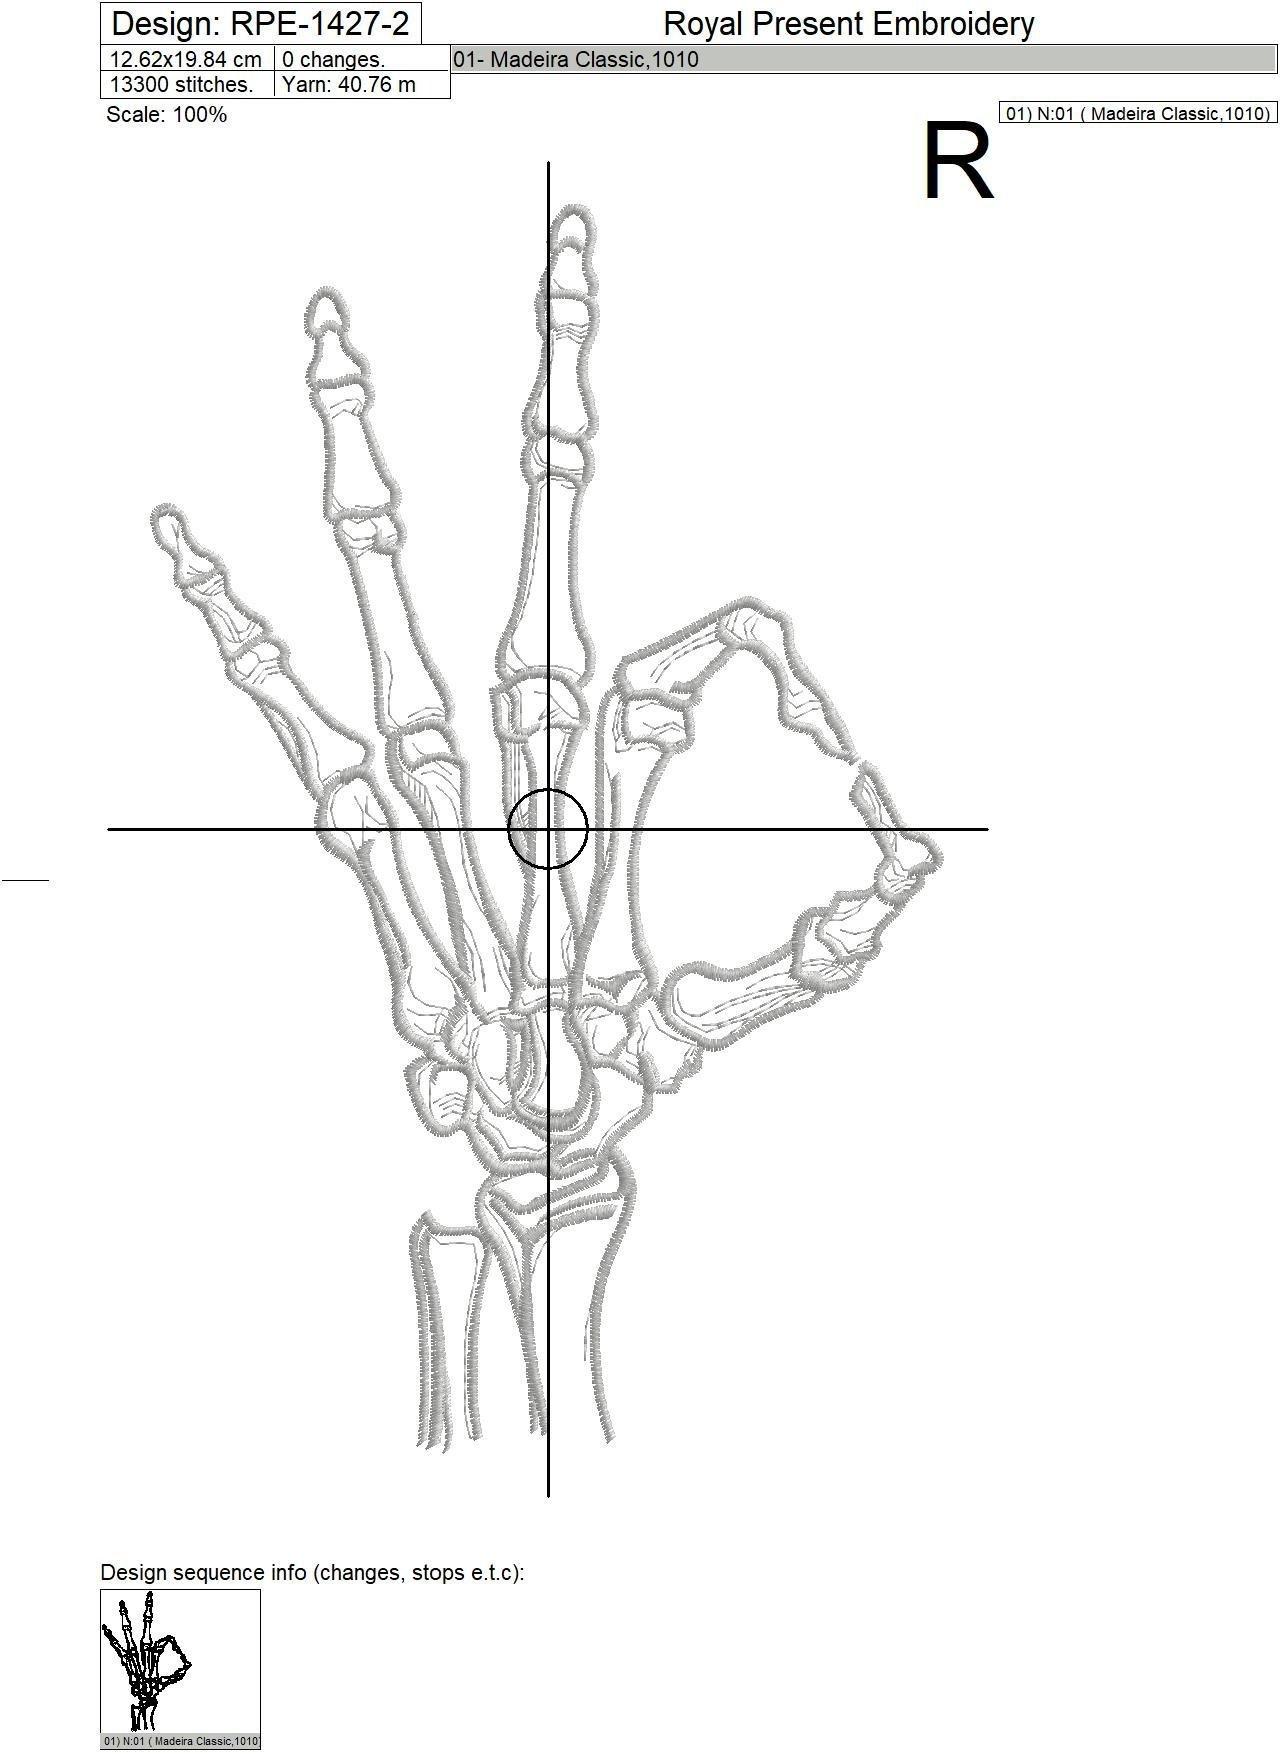 Skeleton hand Gesture Ok Machine Embroidery Design - 3 sizes